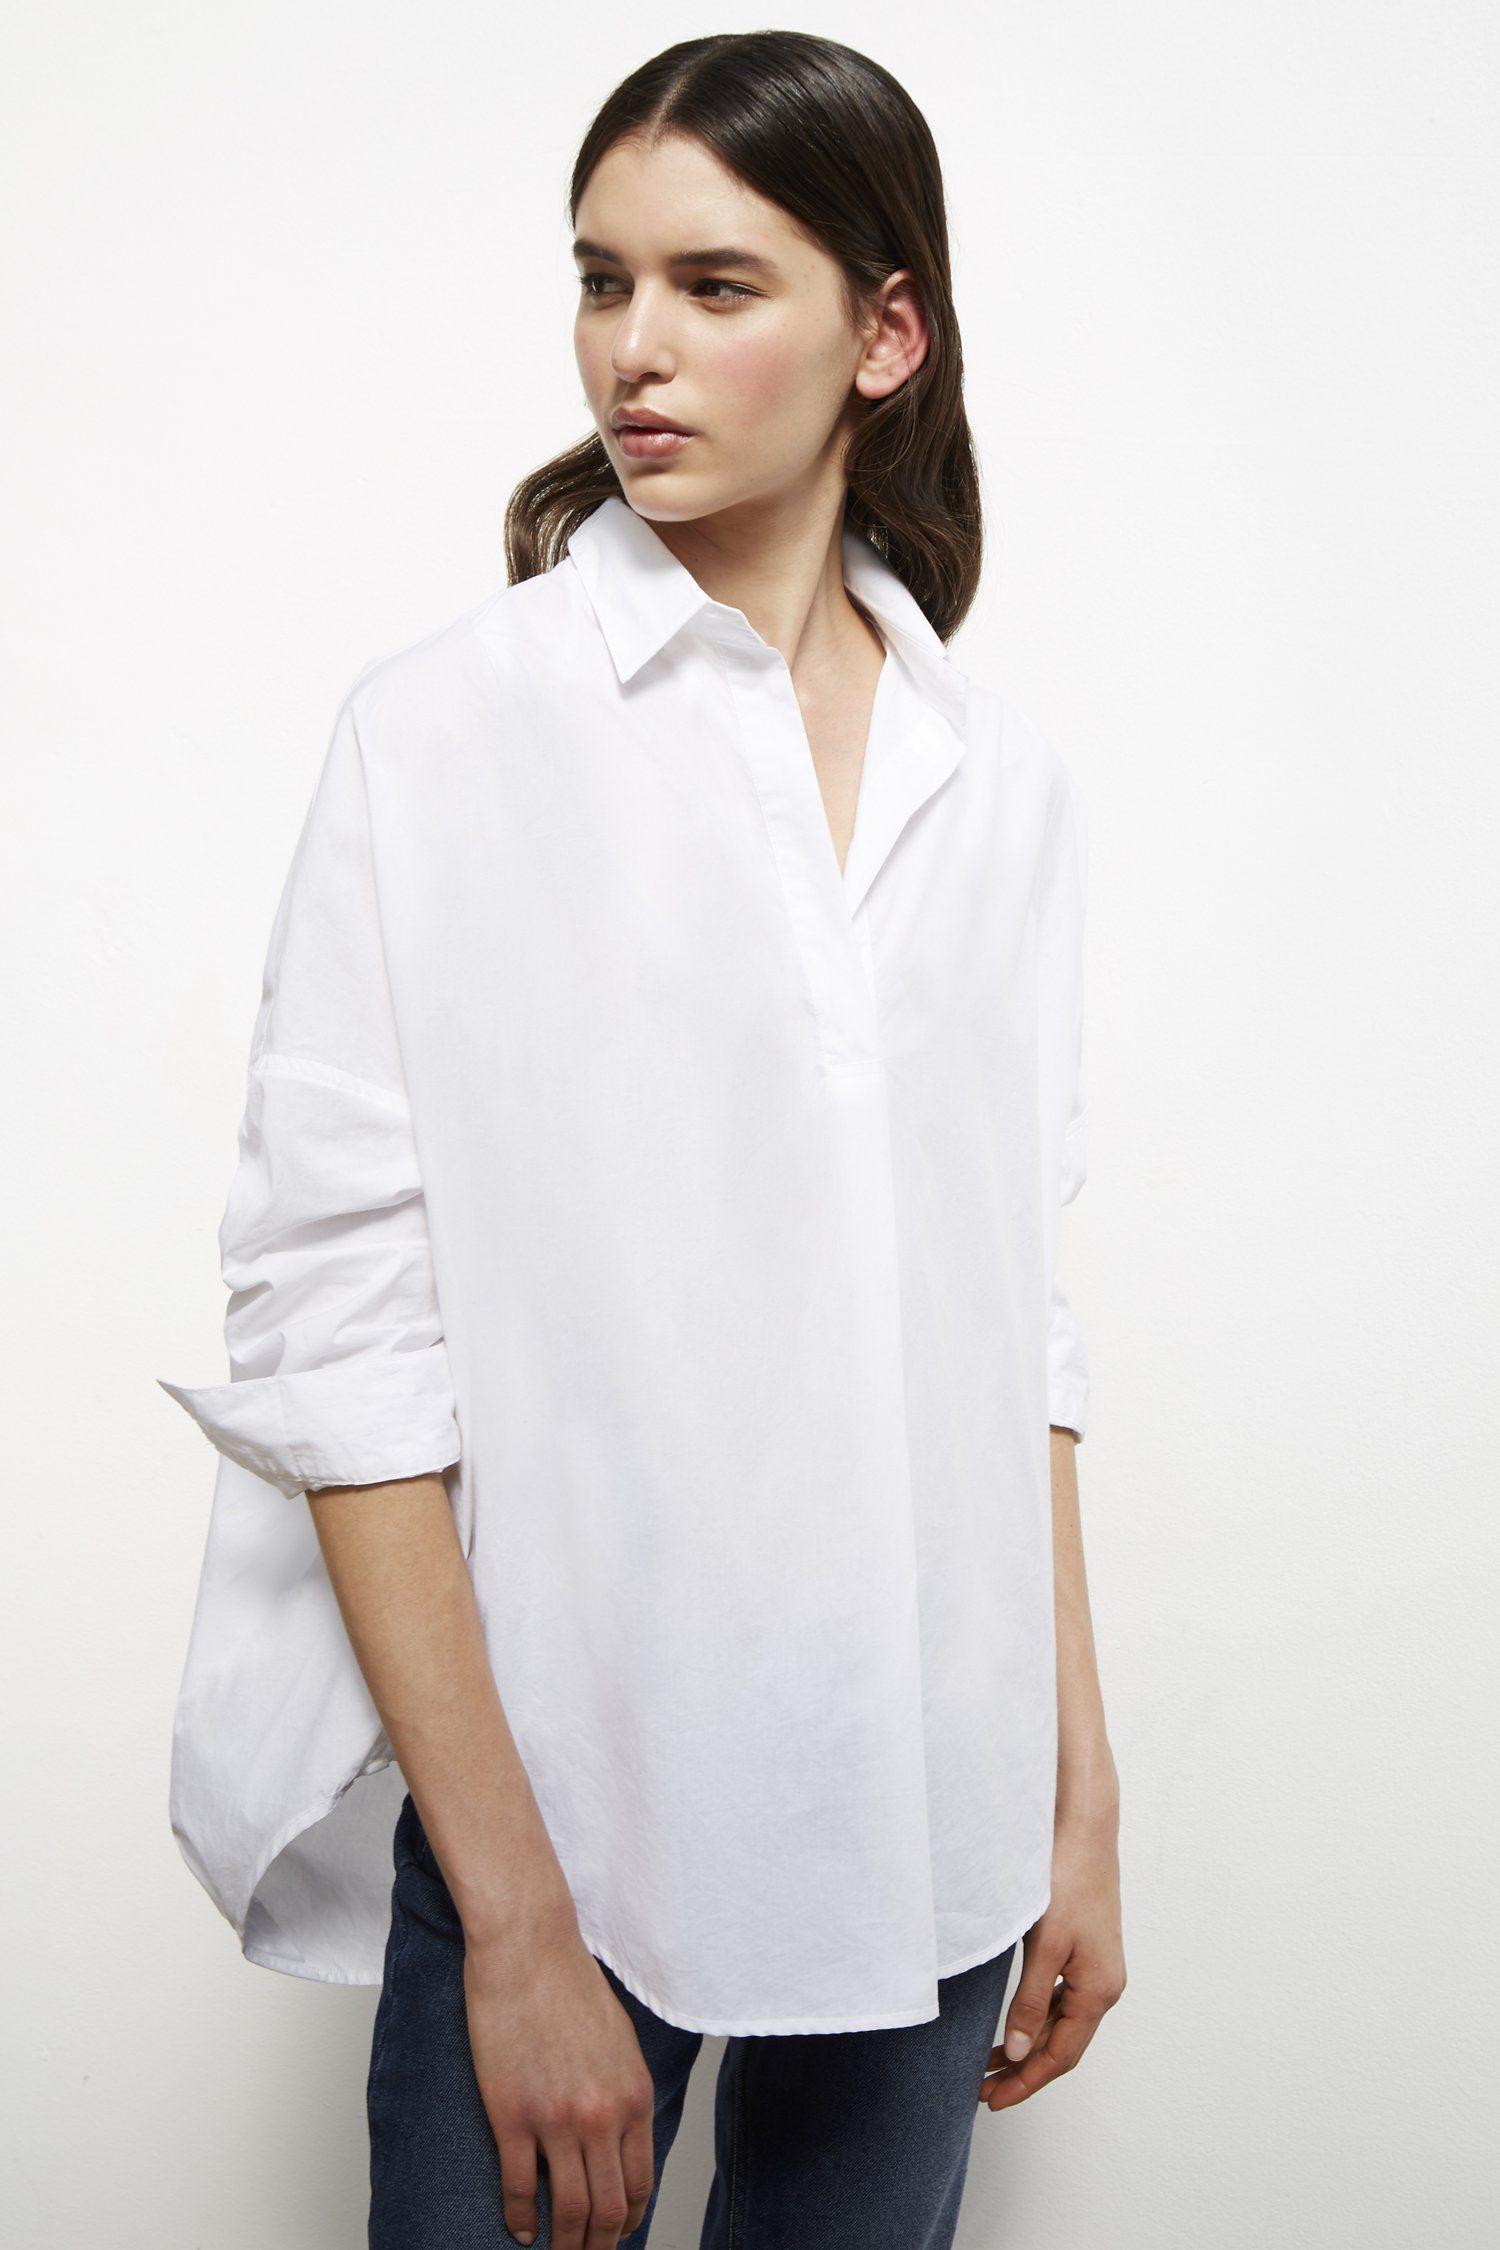 oversized white shirt womens uk